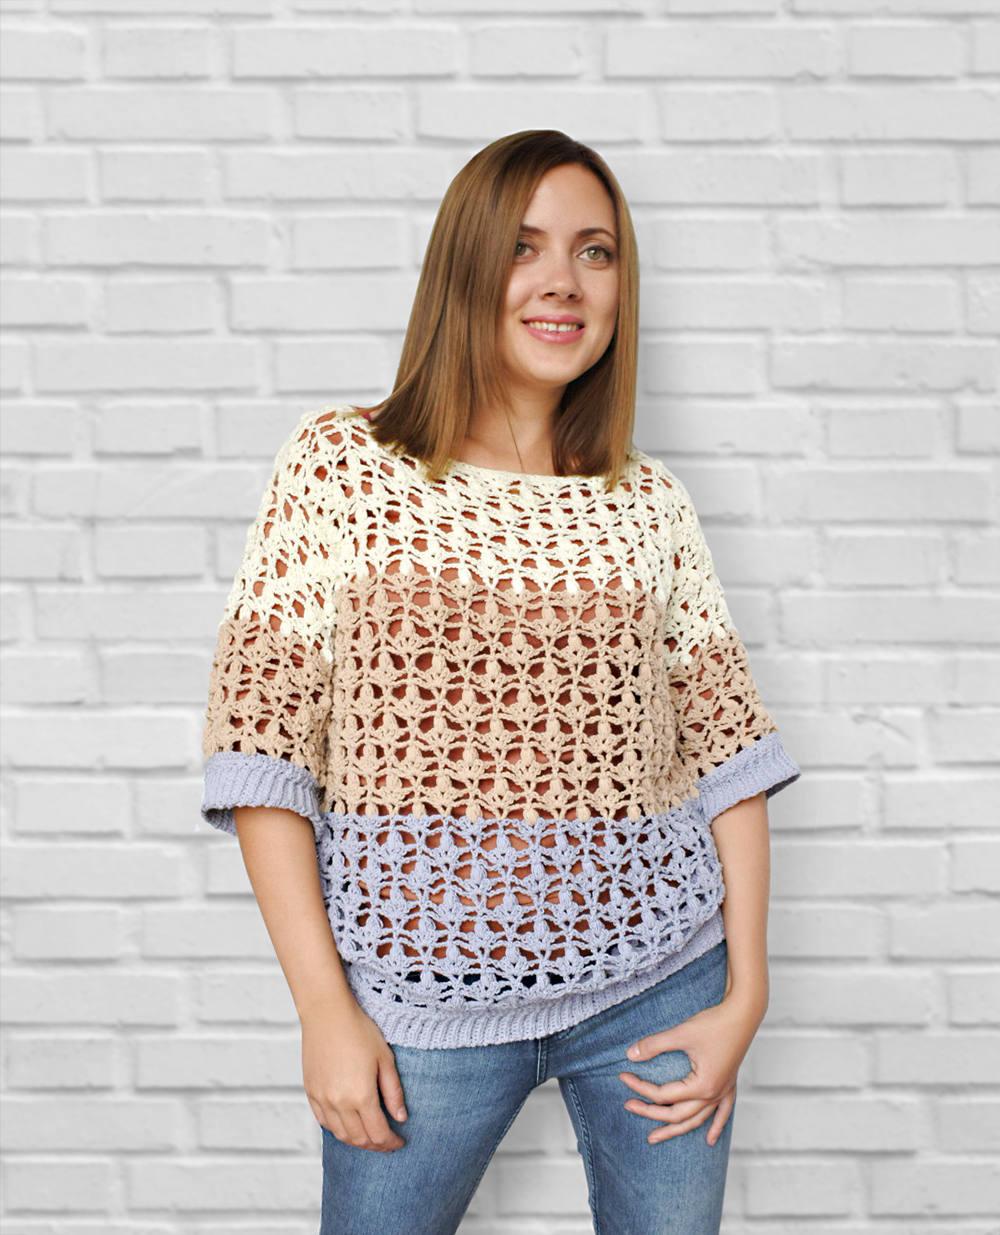 Crochet pdf pattern crochet sweater pattern crochet pullover this is a digital file bankloansurffo Choice Image